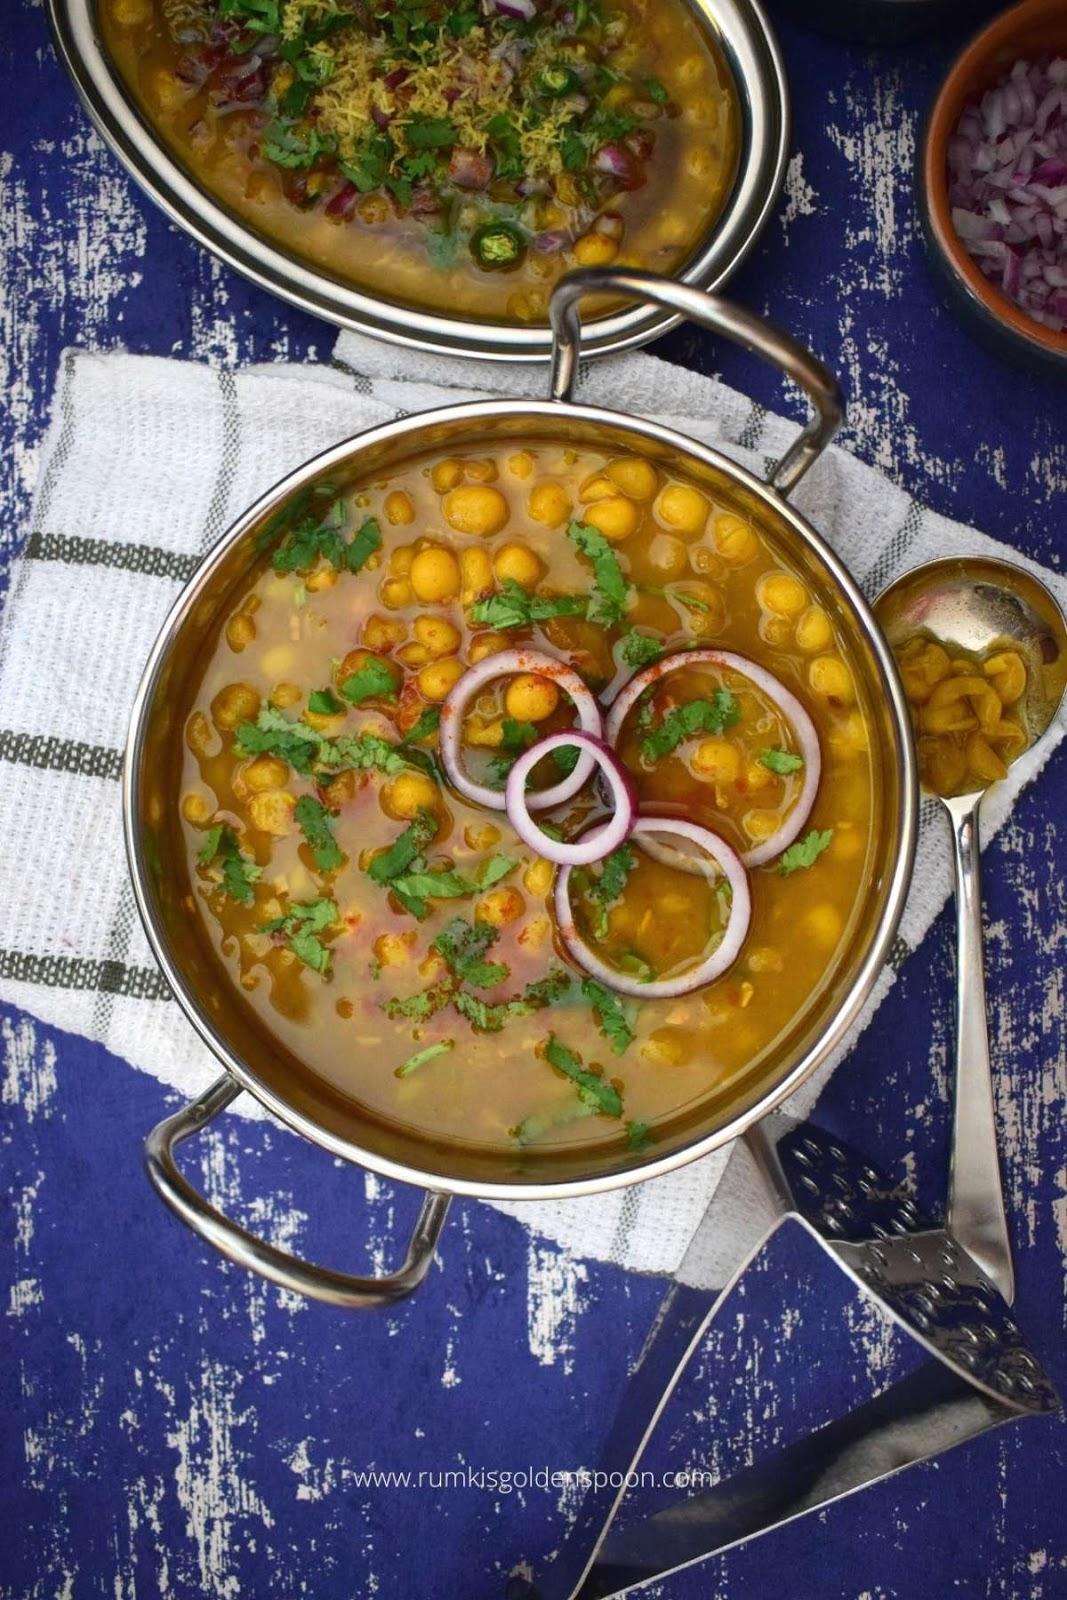 recipe for ragda, ragda, ragda recipe, ragda for pani puri, ragda chaat, how to make ragda, how to make ragda for pani puri, how to make ragda at home, ragda chaat recipe, ragda pattice, ragda pattice recipe, Indian chaat recipe, Indian chaat recipes, chaat recipe, recipe for chaat, recipes of chaat, chaat papdi recipe, chaat recipe Indian, indian street food, list of indian street food, recipes for Indian street food, recipes of Indian street food, best Indian street food recipes, Indian street food recipes, Indian snack recipe, Indian snack recipes, Indian snacks recipes for evening, Indian snacks easy recipes, Rumki's Golden Spoon